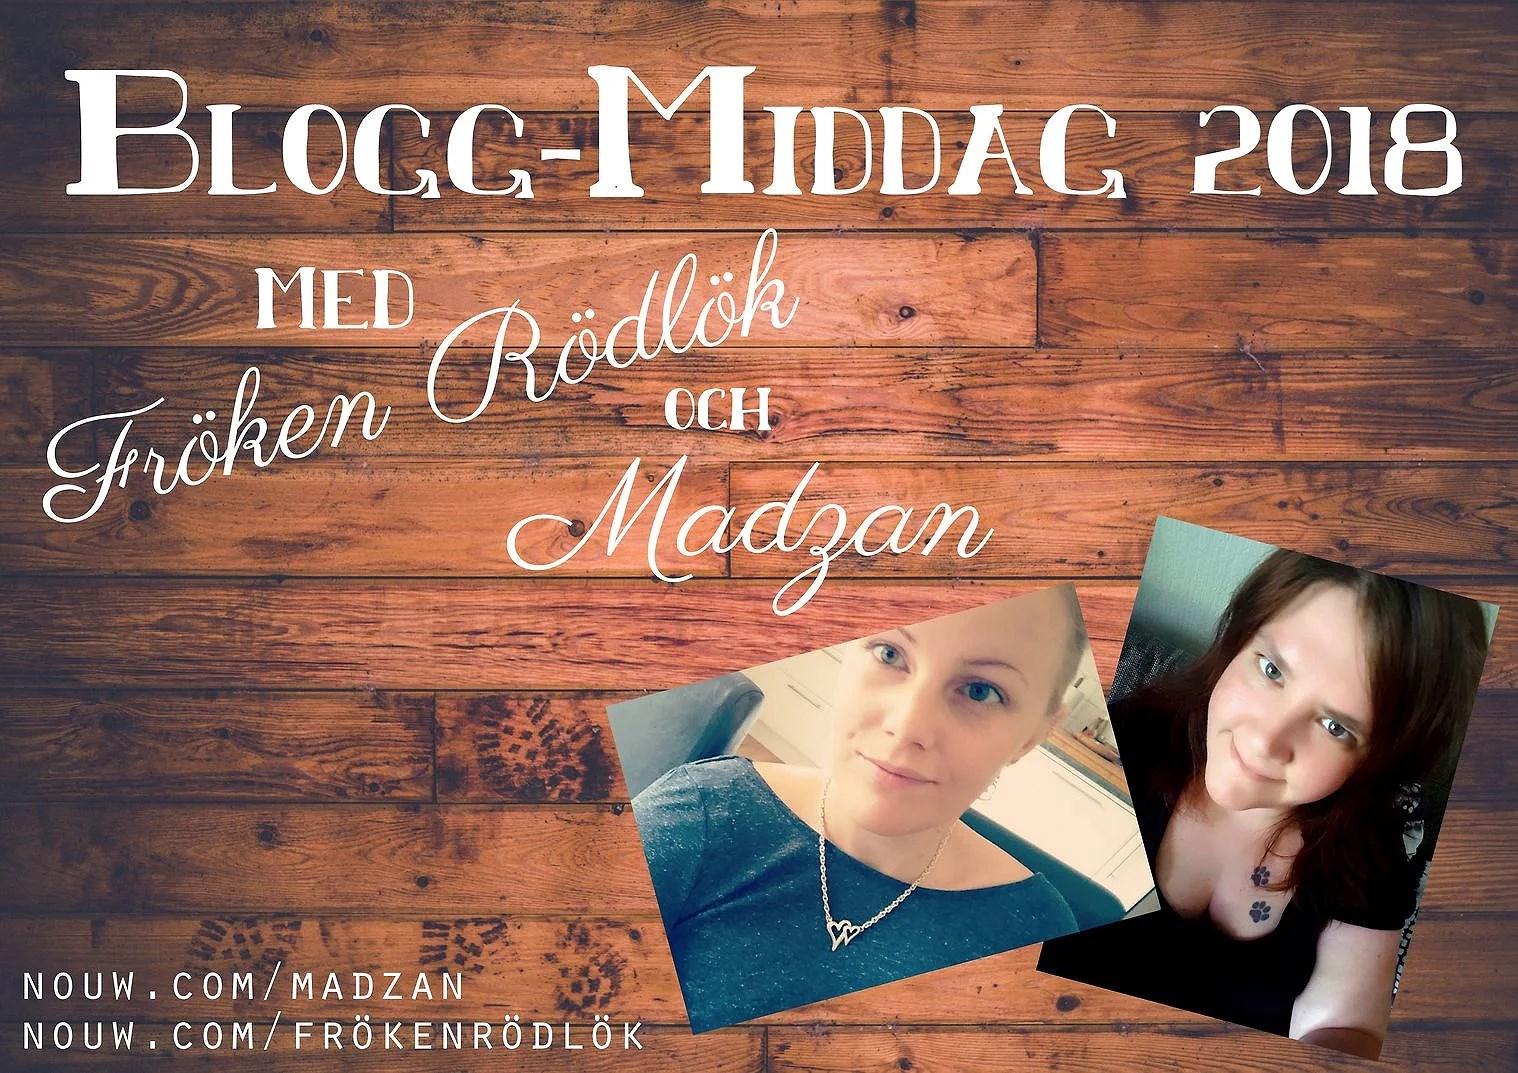 Blogg-middag 2018 - Anmäl ditt intresse!